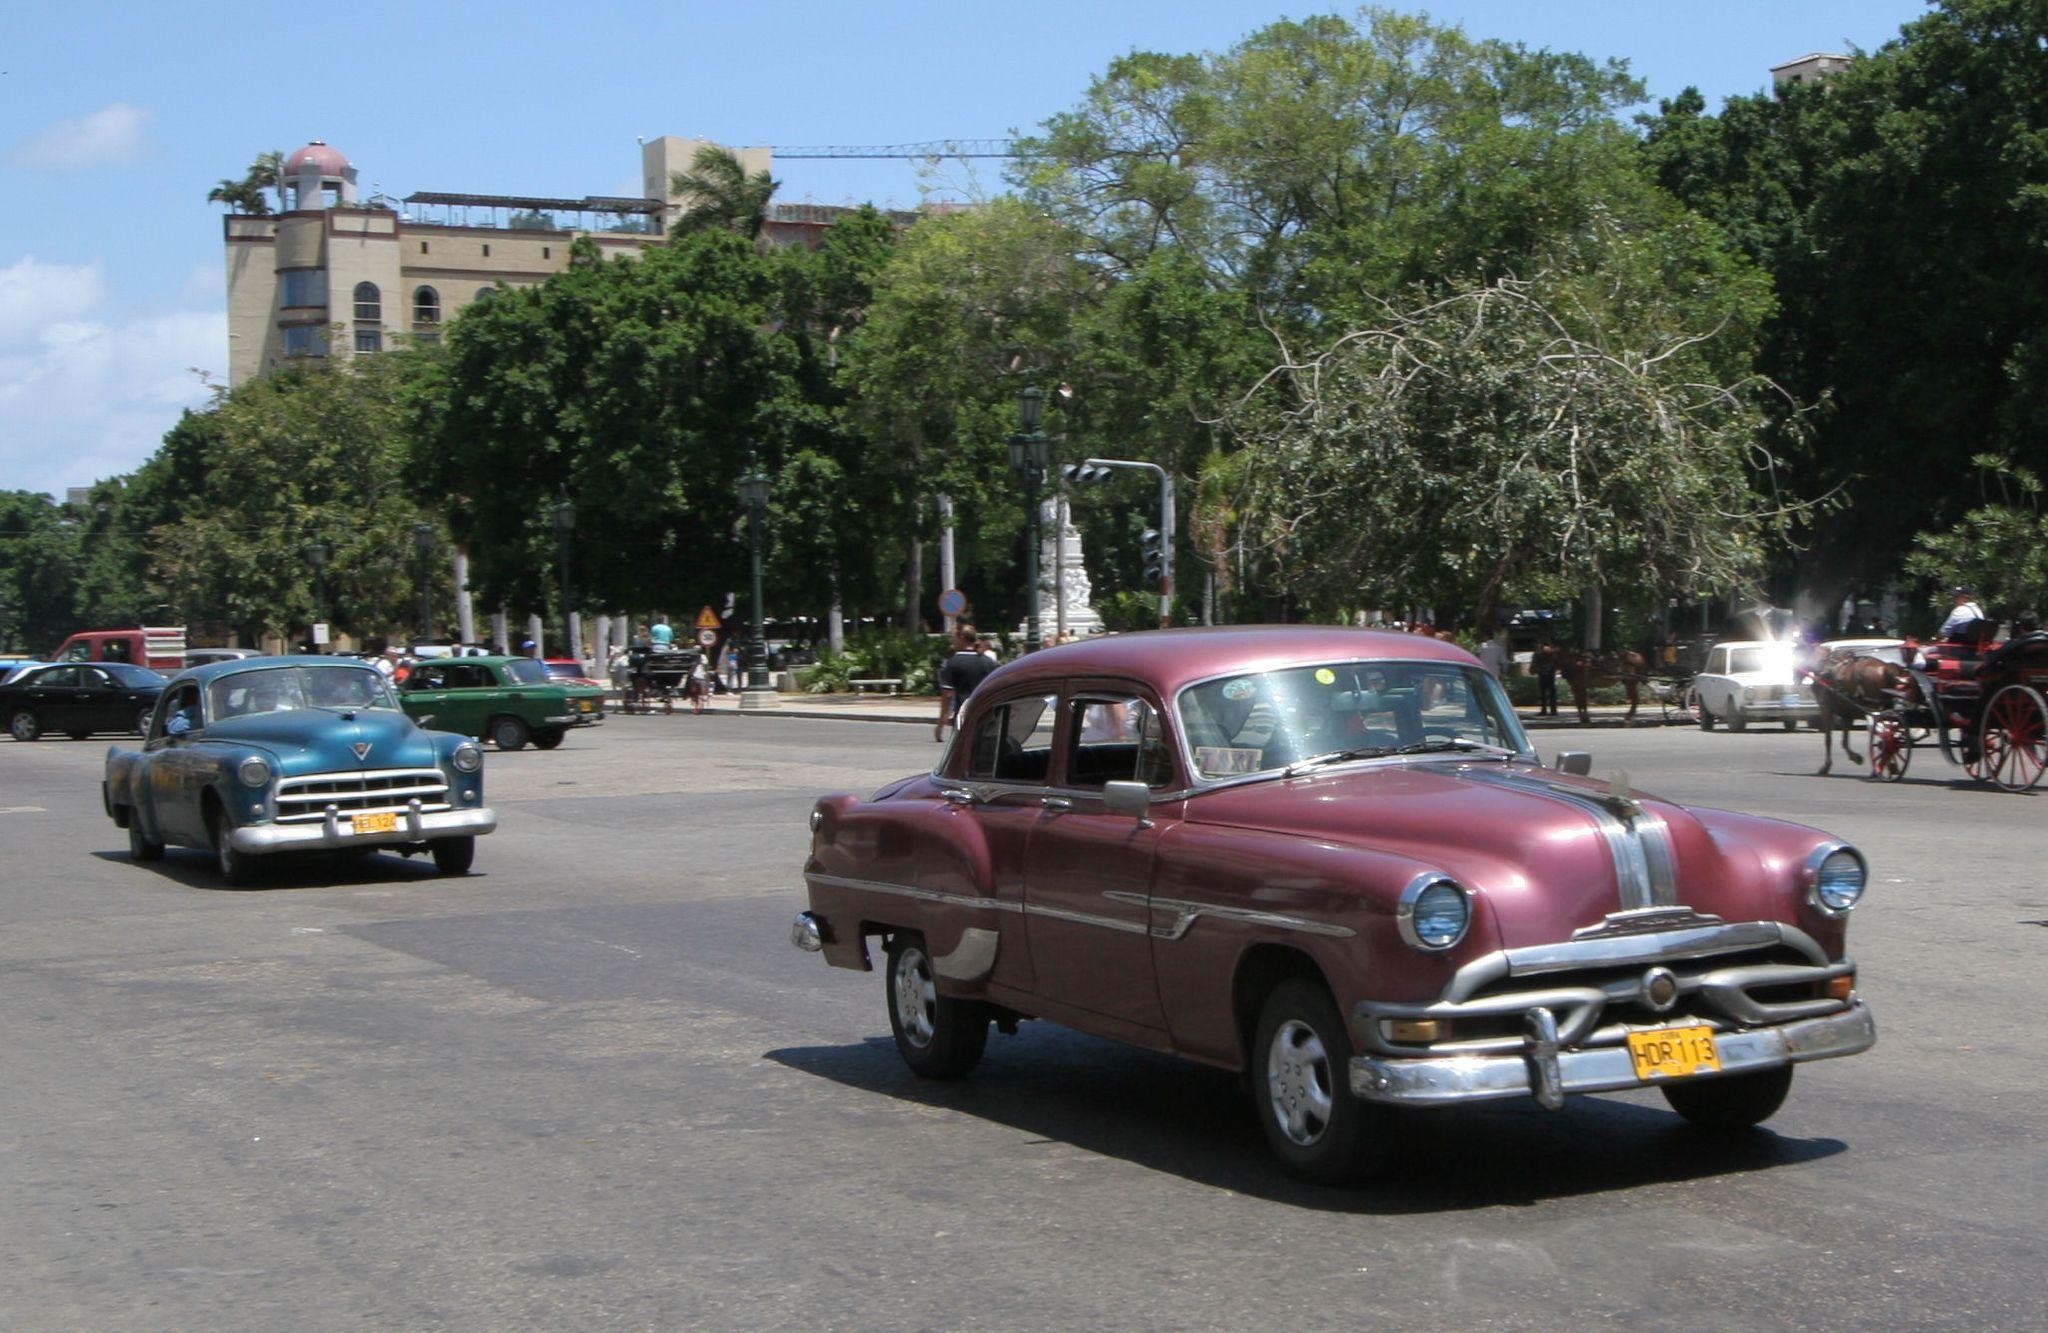 File:Old US cars in Havana - Flickr - exfordy (3).jpg - Wikimedia ...